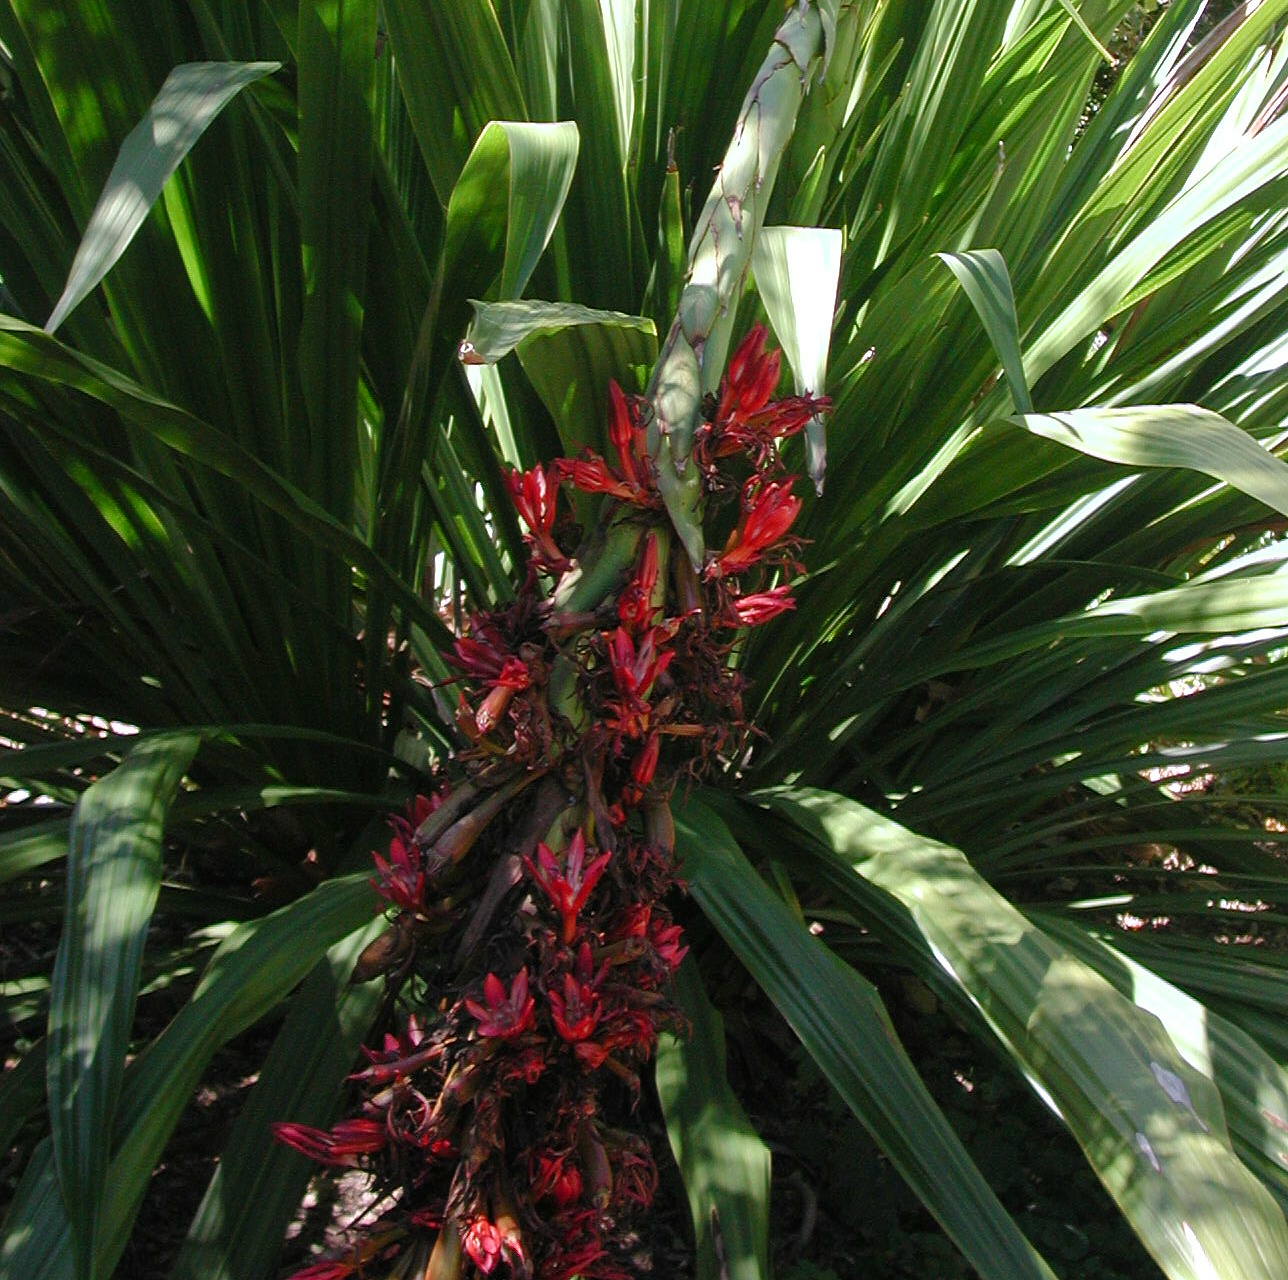 Doryanthus palmeri